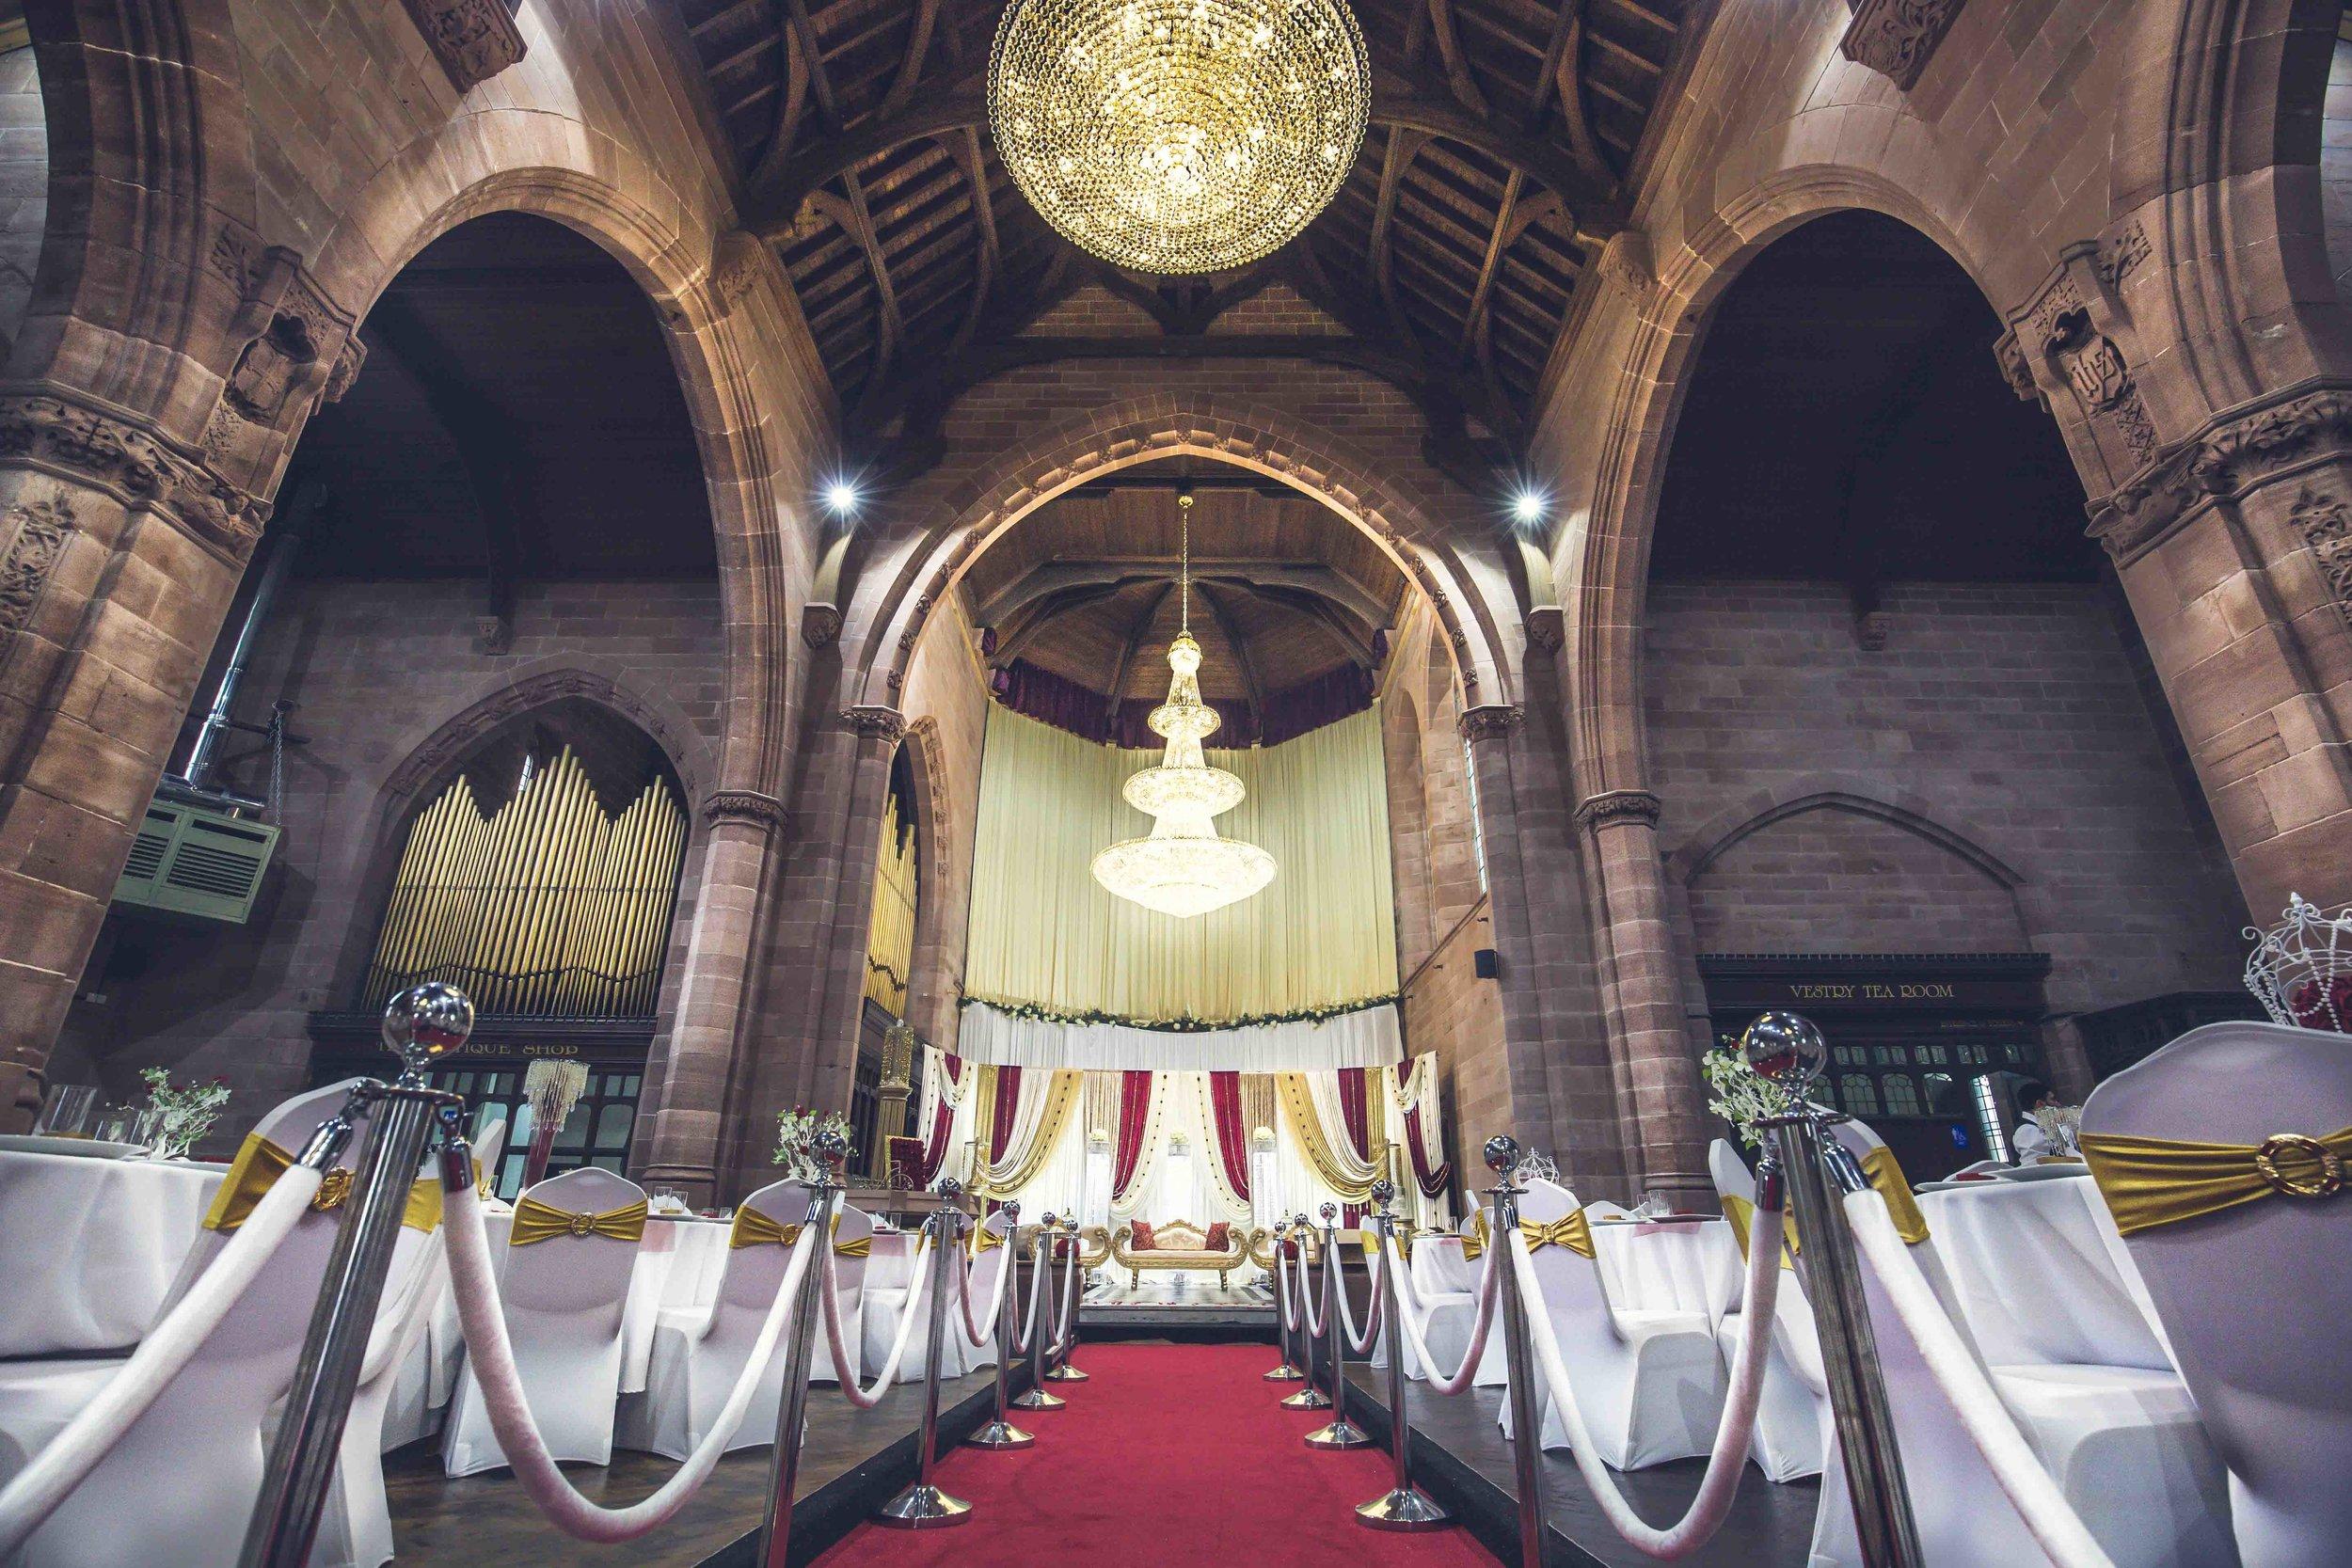 Asian Wedding Photographer Opu Sultan Photography Lyme Park Scotland Edinburgh Glasgow London Manchester Liverpool Birmingham Wedding Photos prewed shoot Jams & Tams Blod-15.jpg